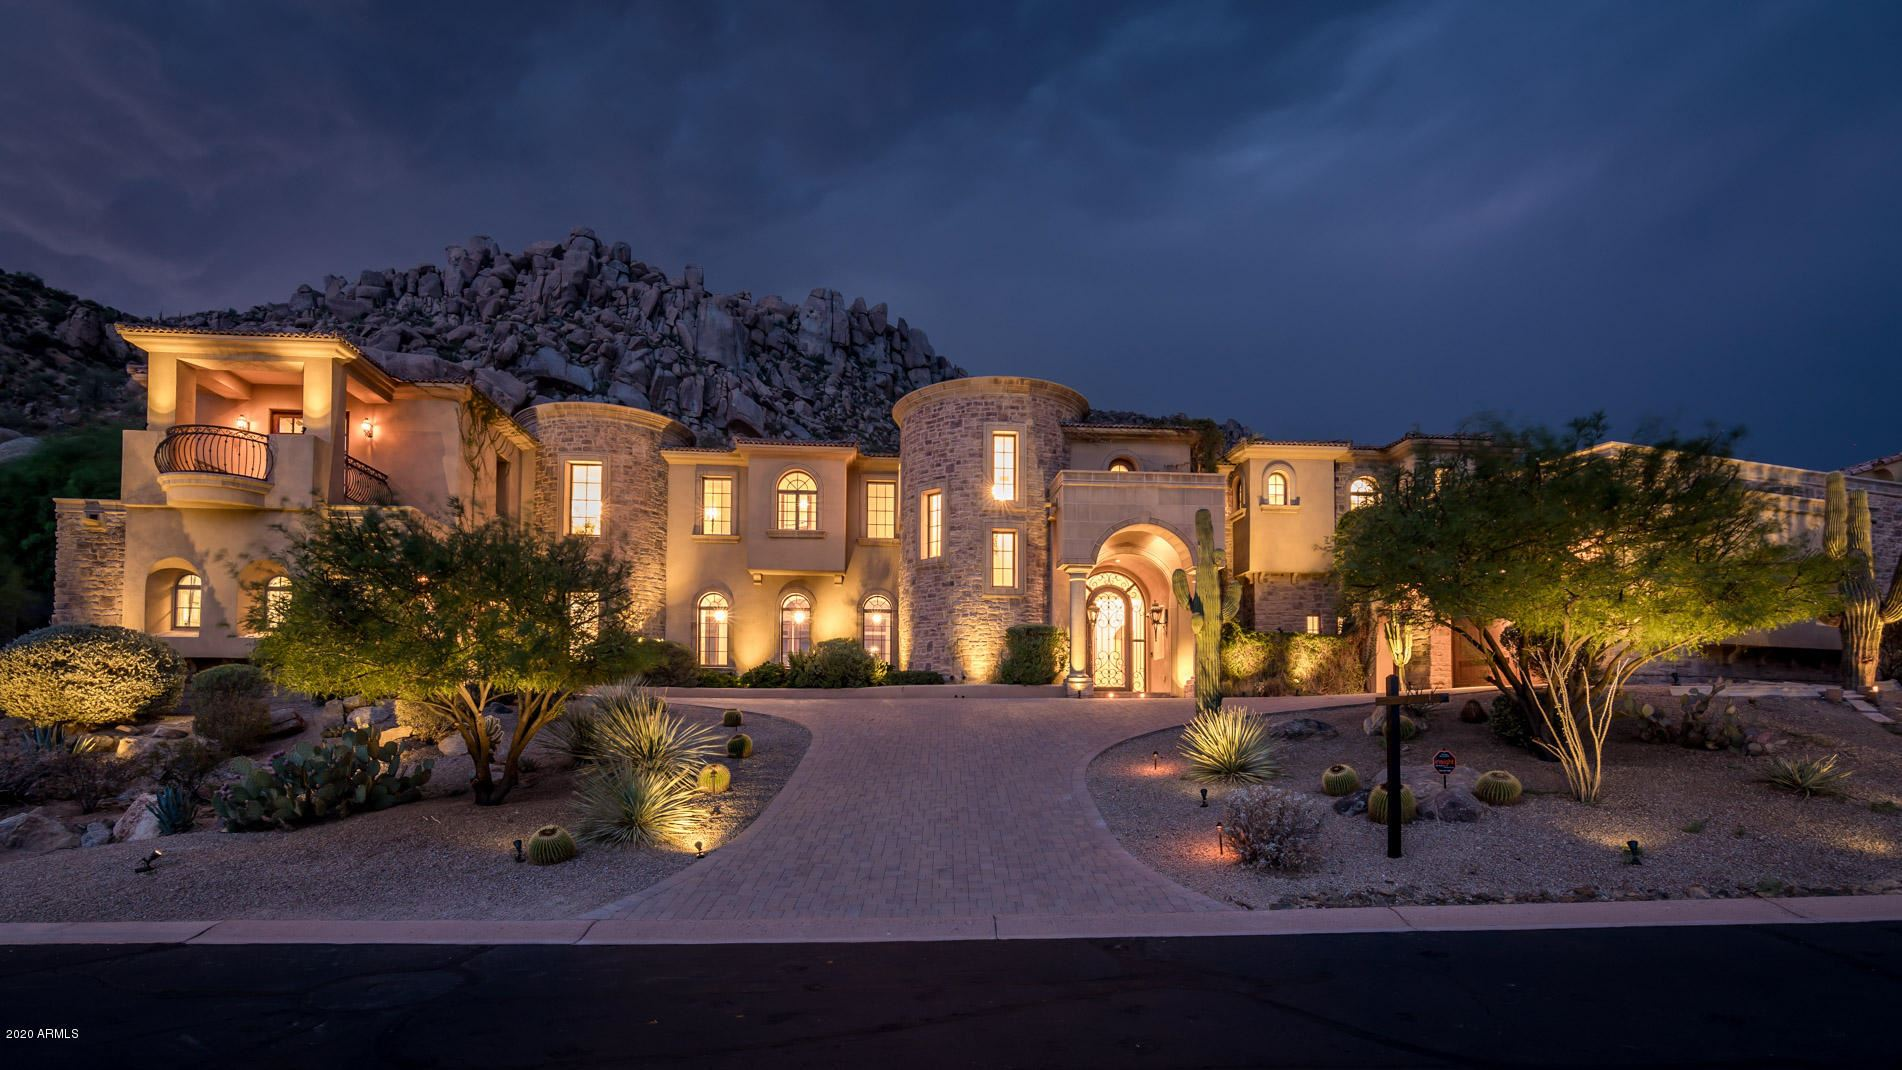 25228 N 114TH Street, Scottsdale, AZ 85255 - MLS#: 6066598